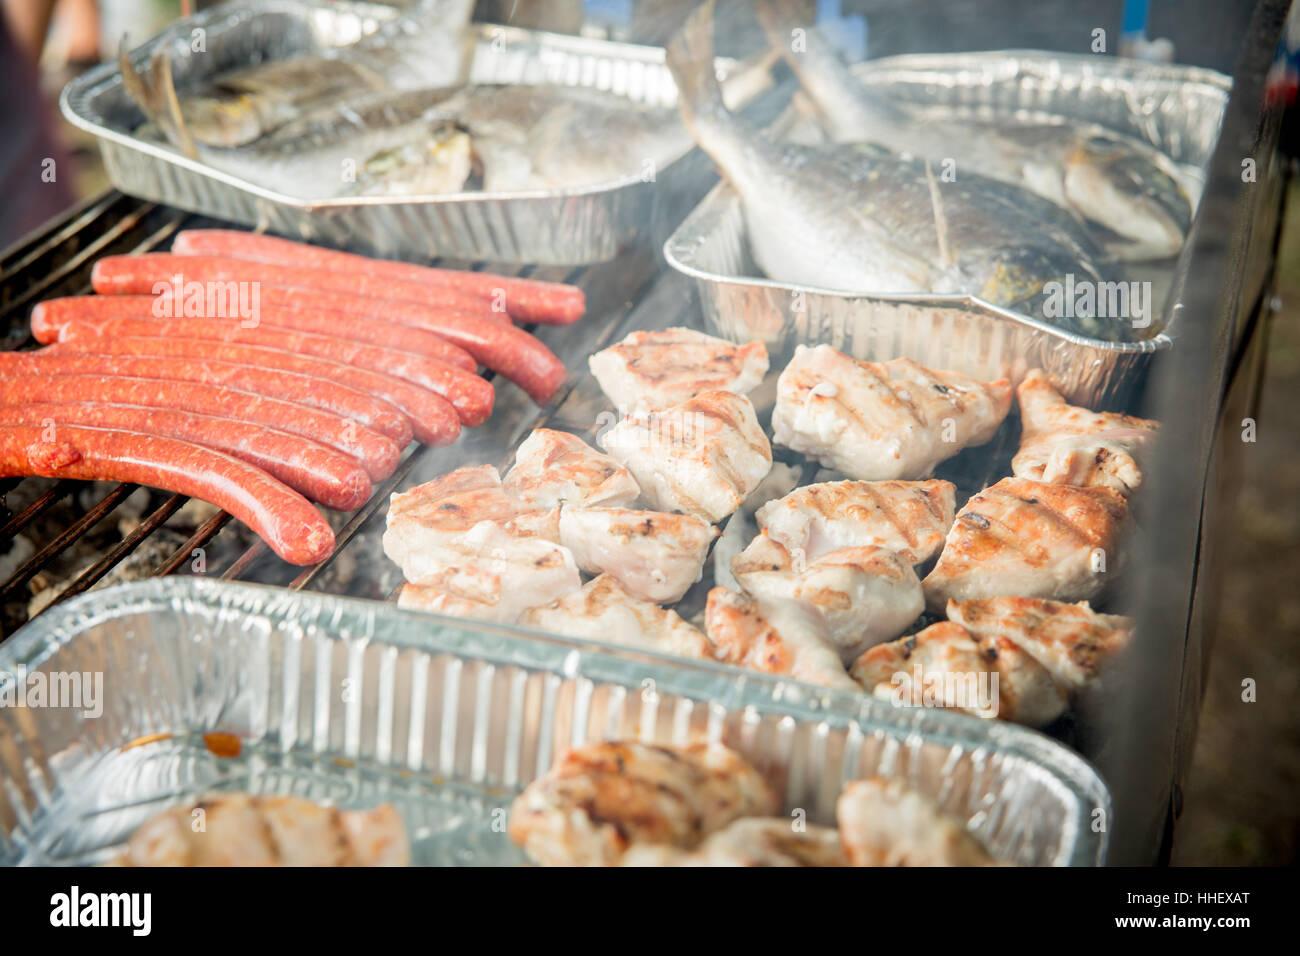 grillfeier photos & grillfeier images - alamy